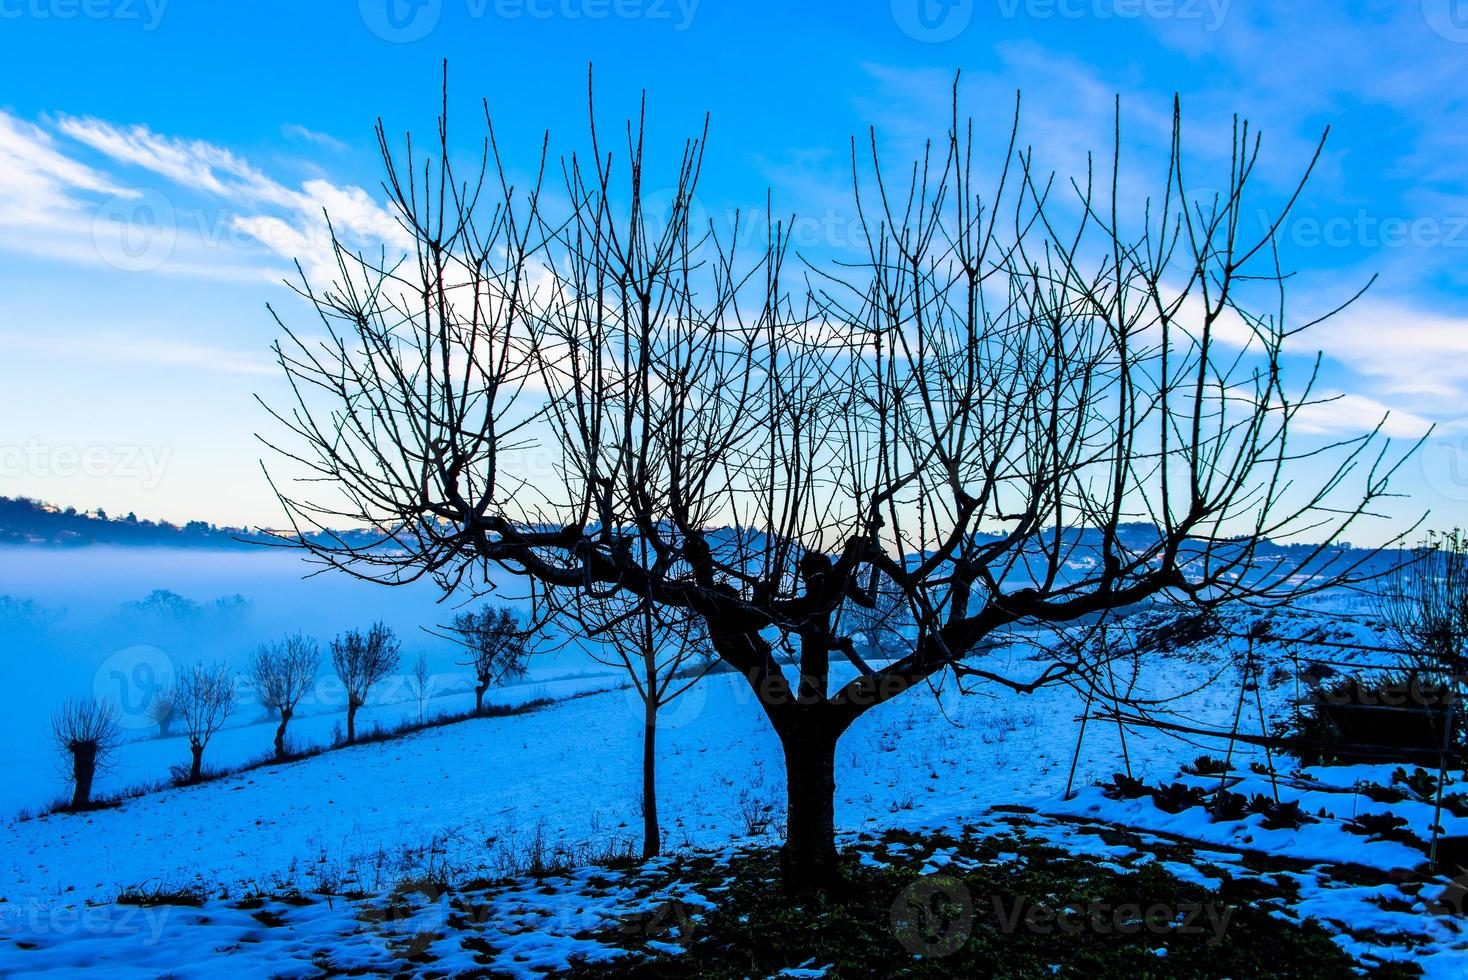 tree among the snow photo